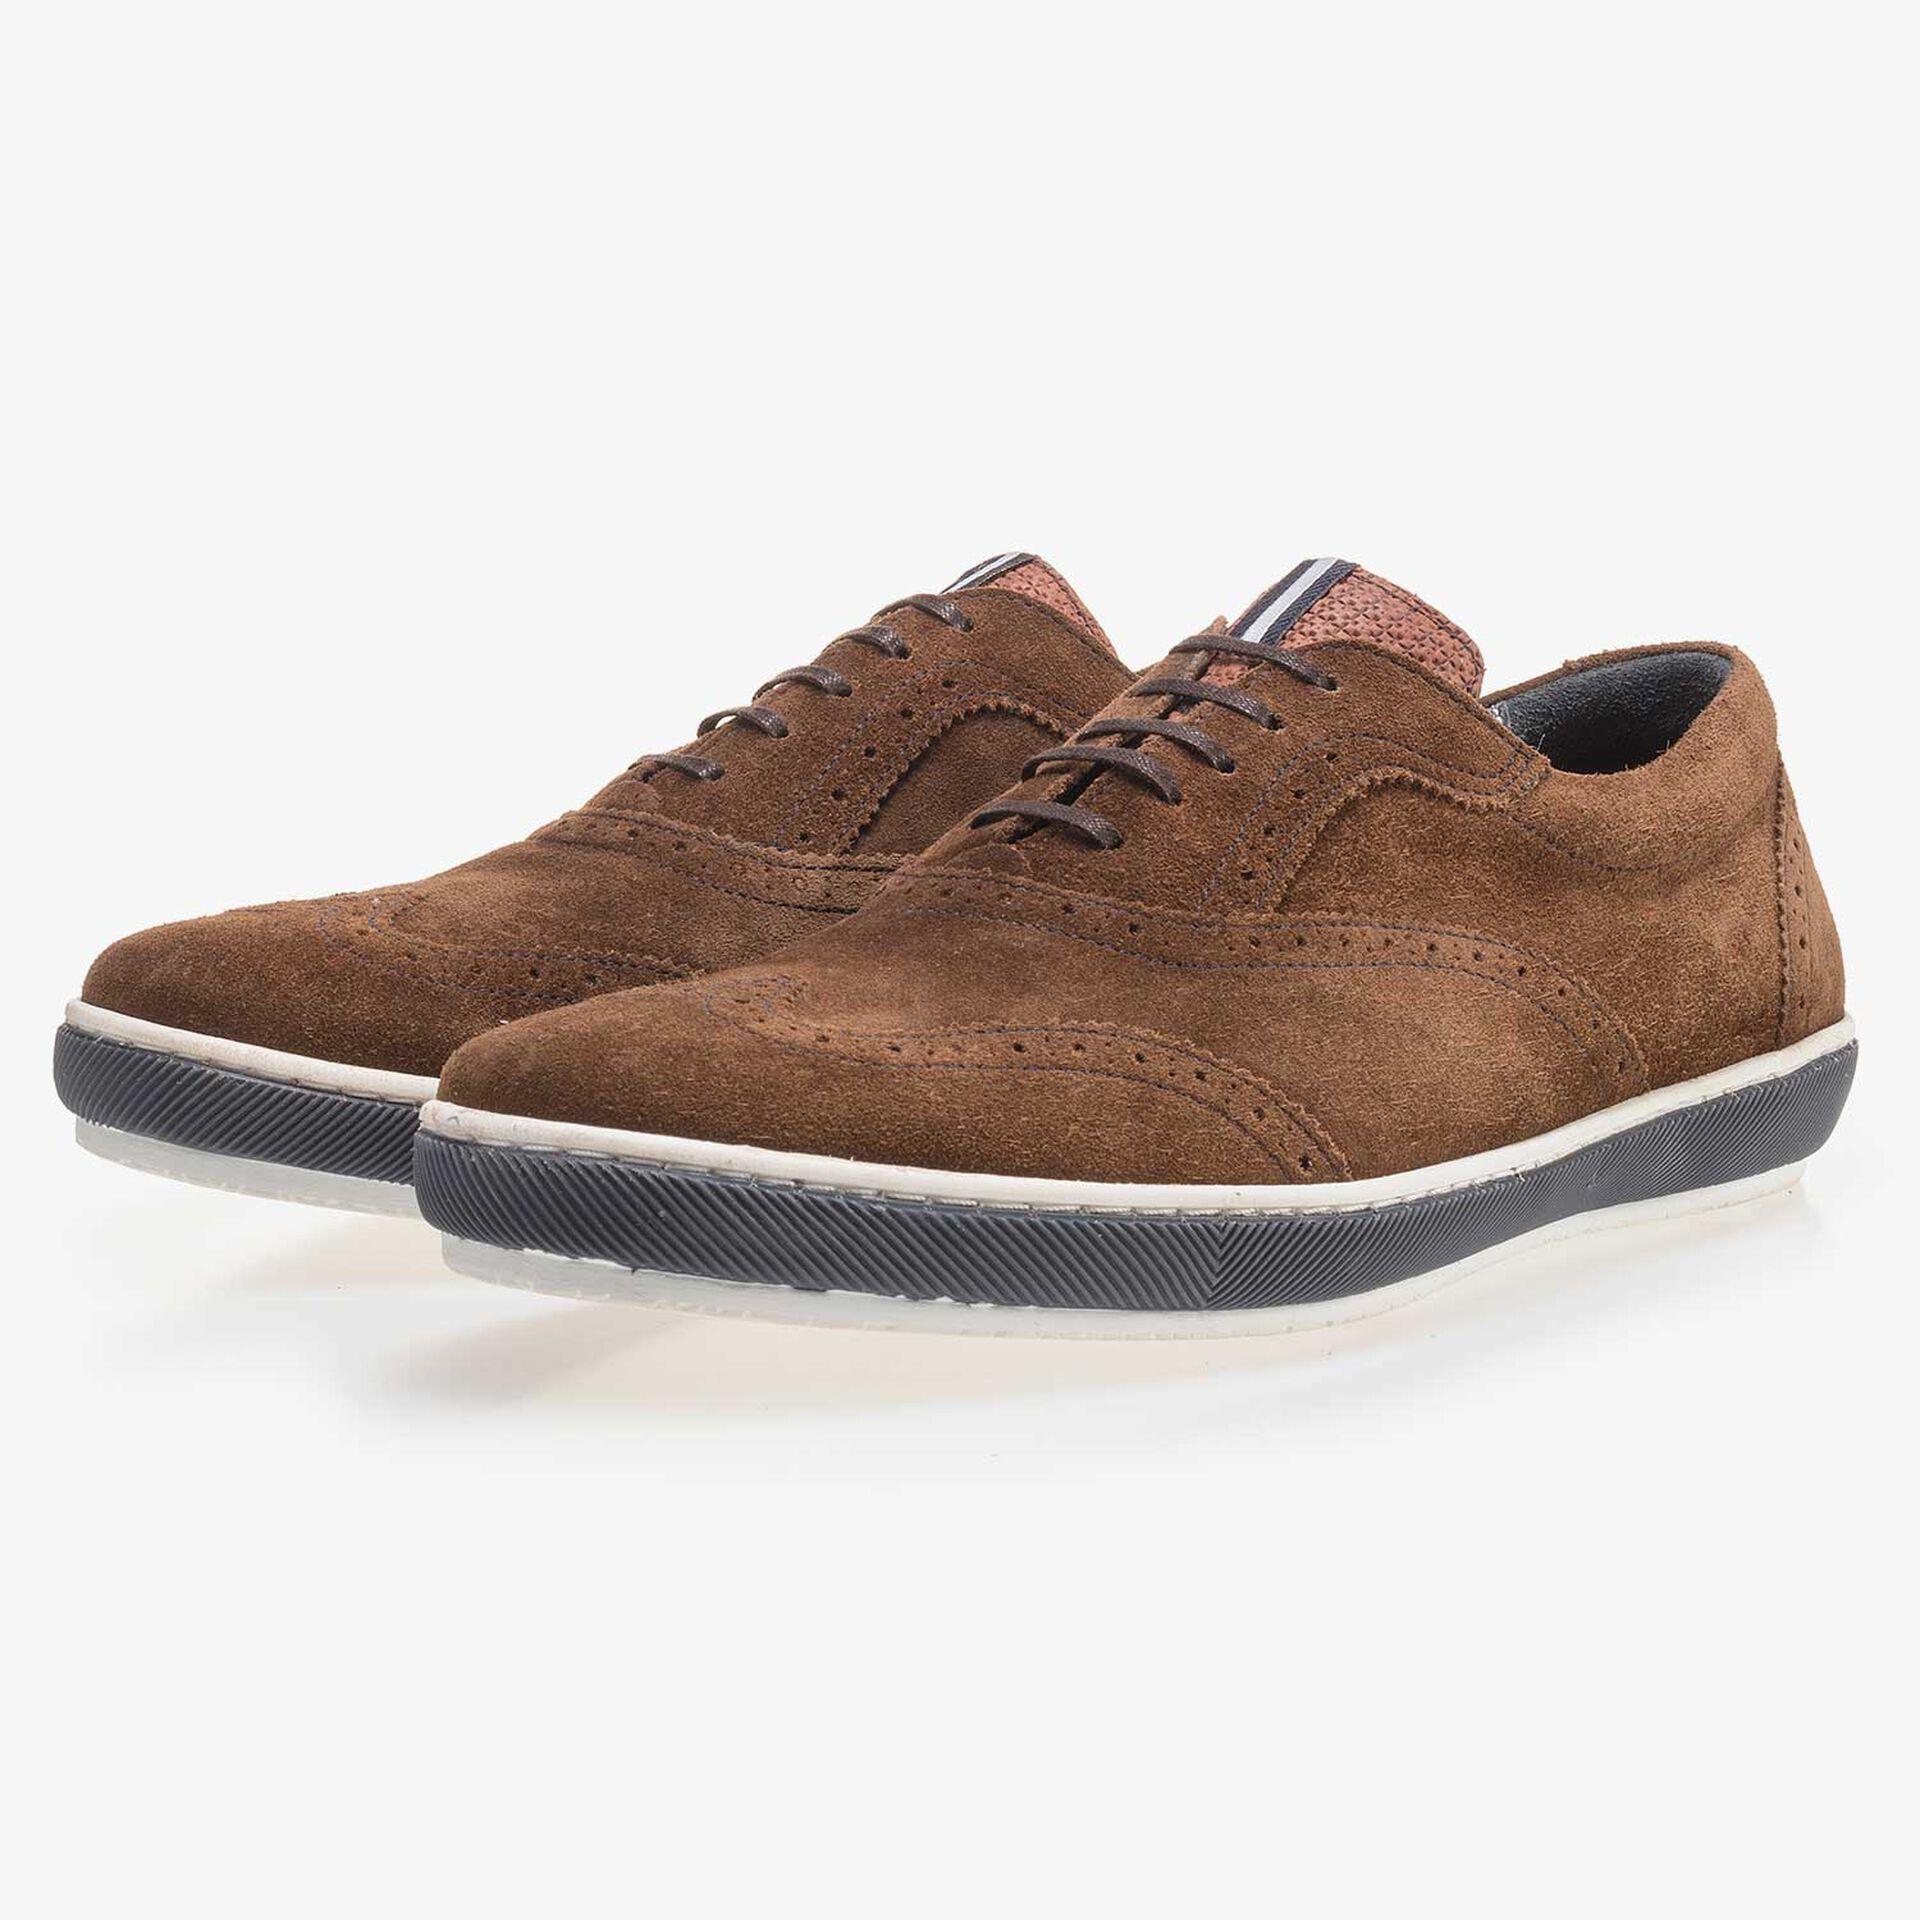 Brown brogue suede leather sneaker